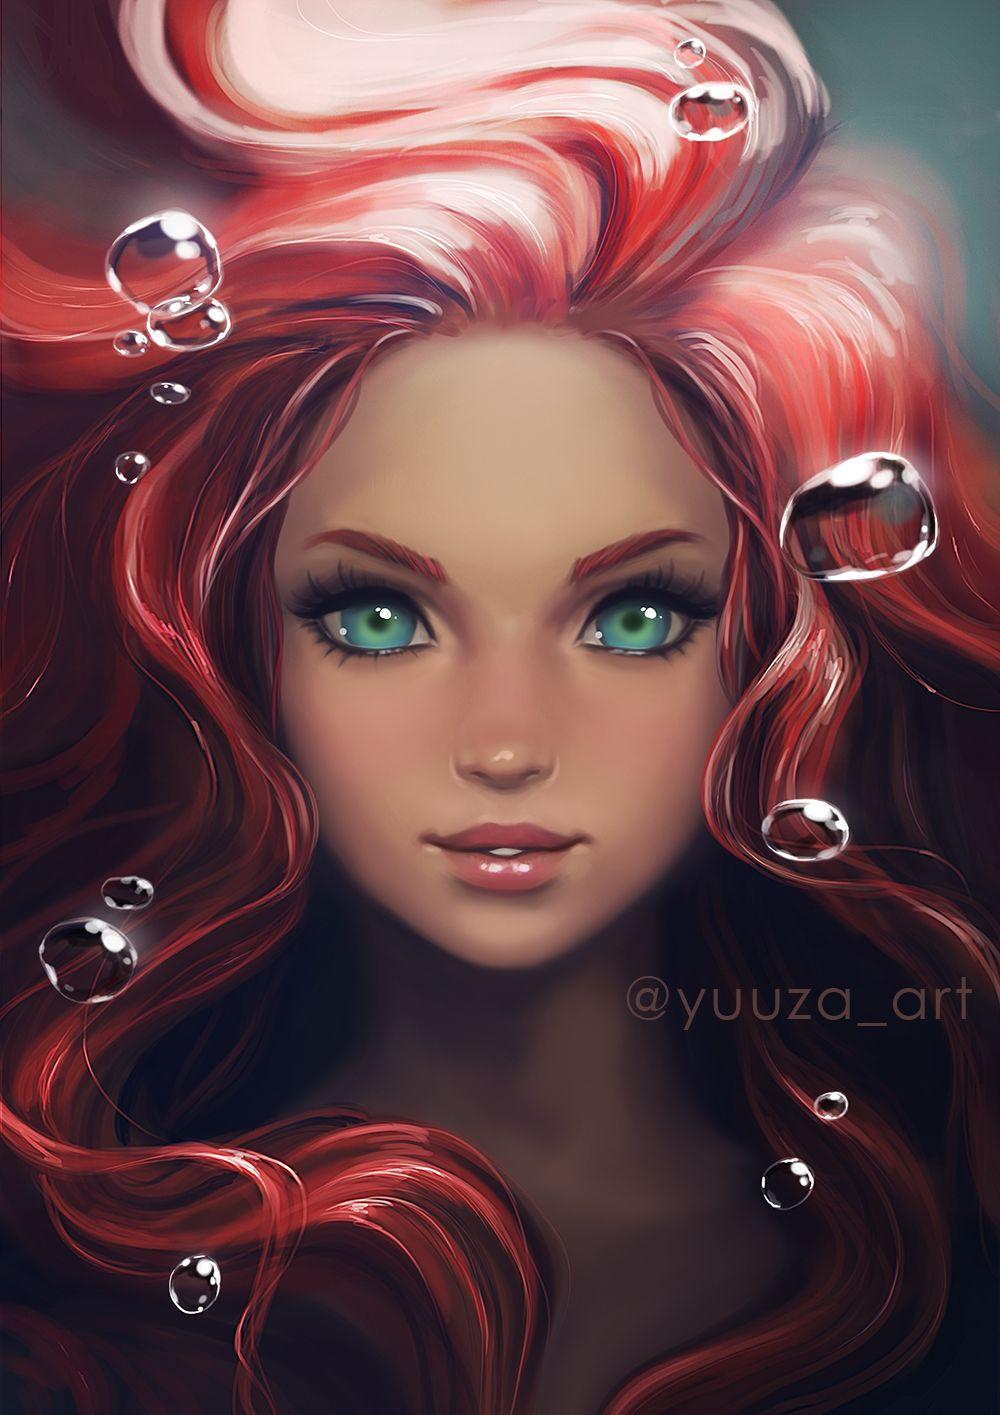 Anime mermaid image by Carolyn Spoto on anime   Anime ...  Manga Mermaid Princess